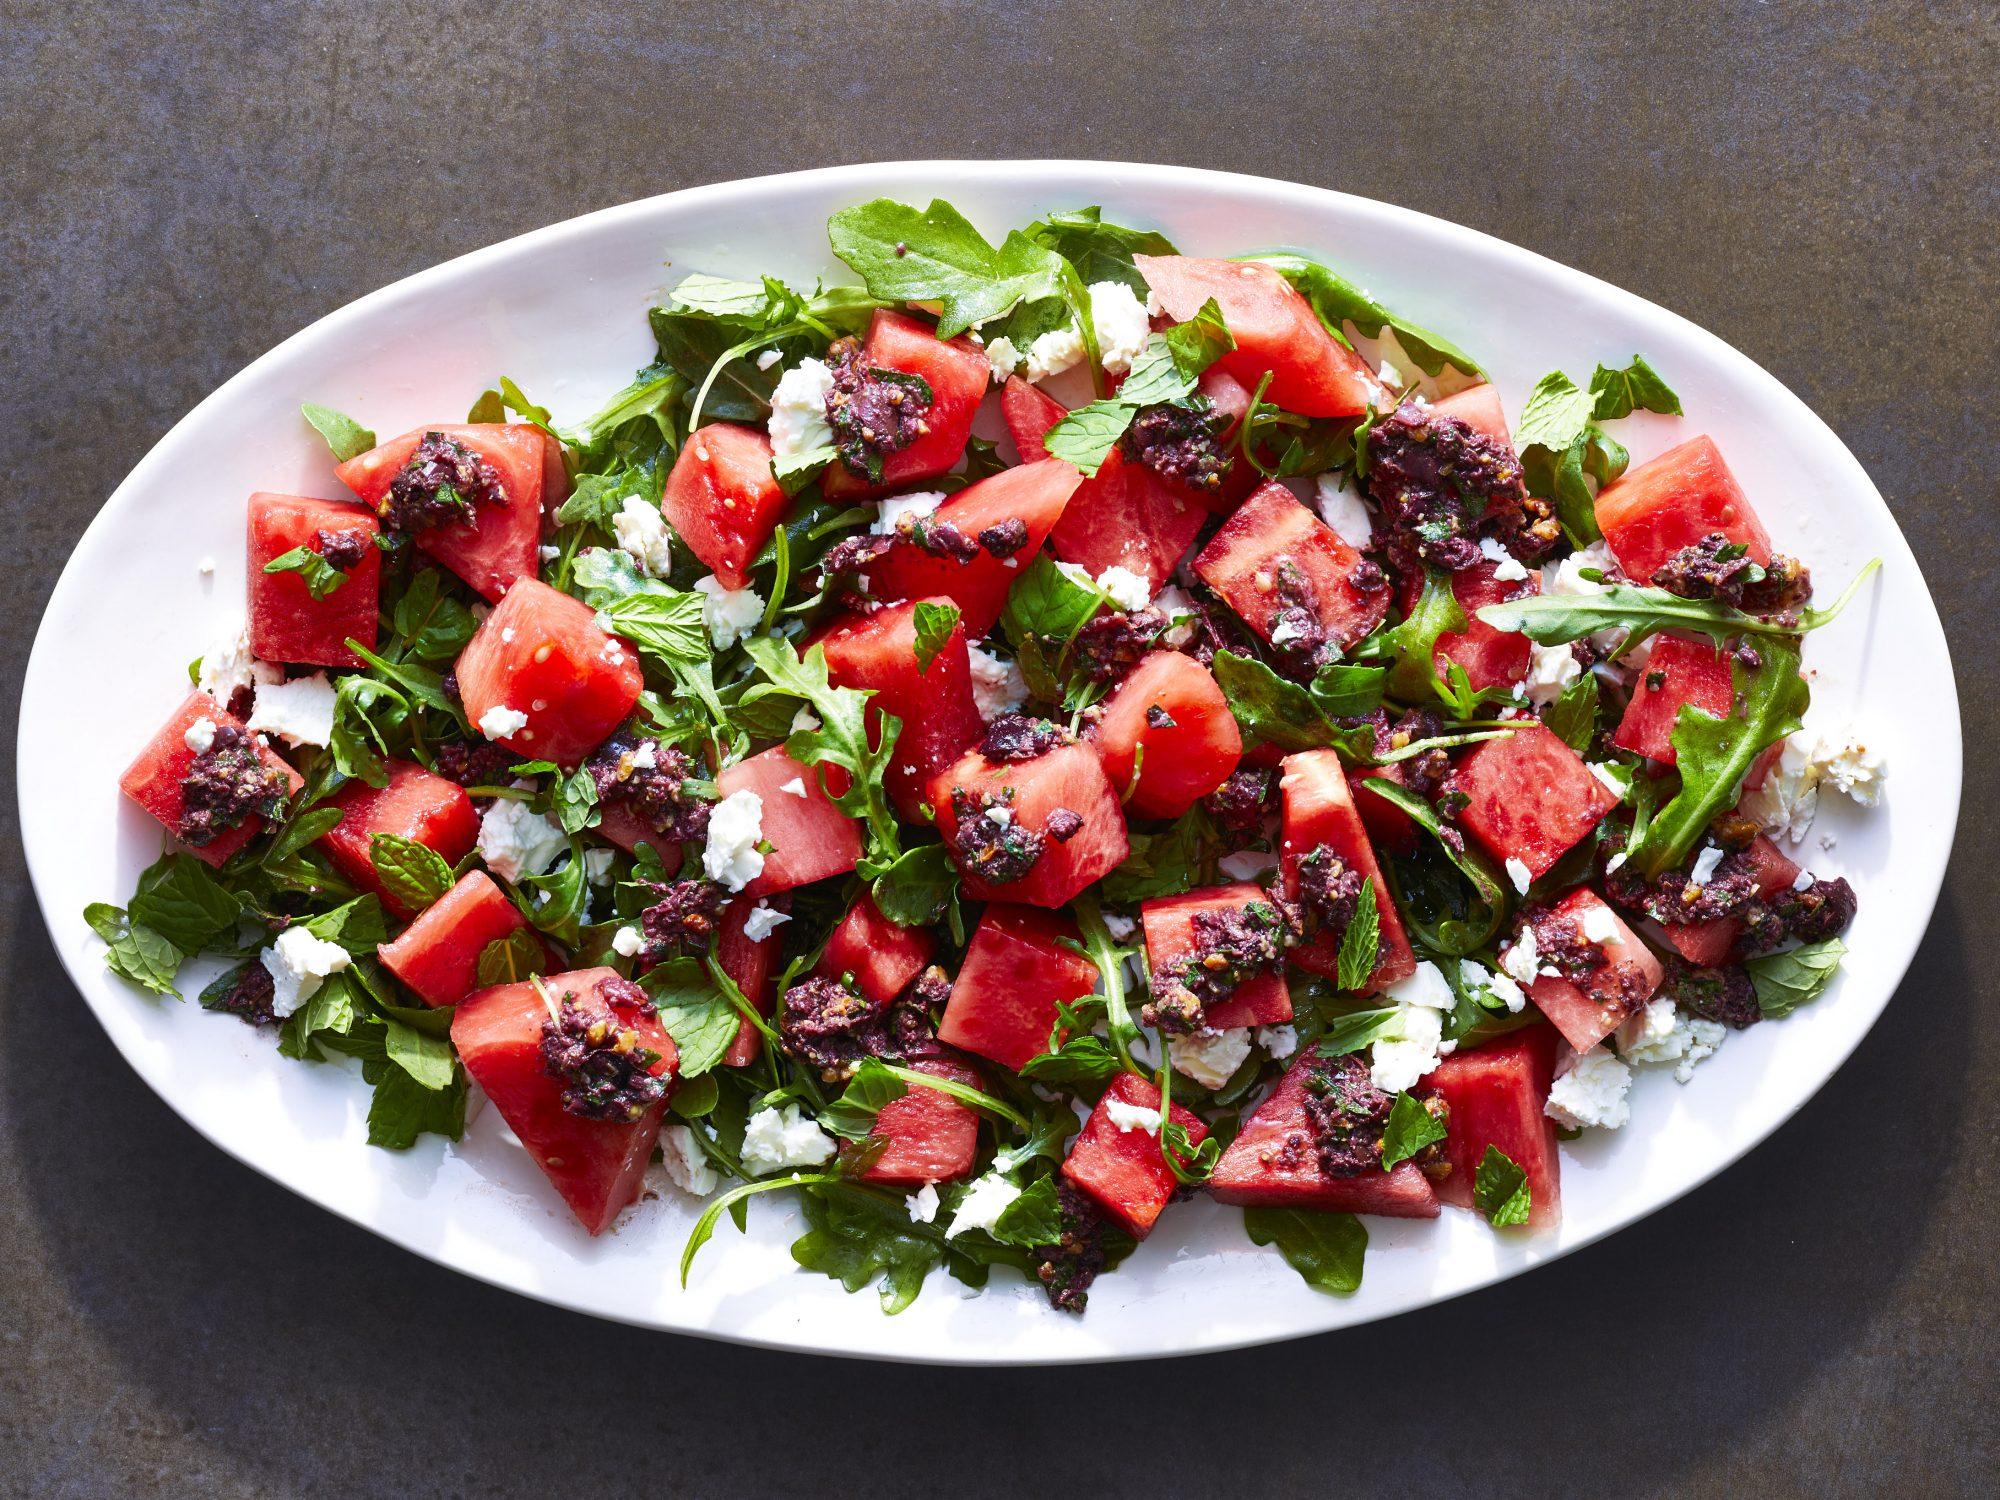 Watermelon Salad with Kalamata Olive Vinaigrette